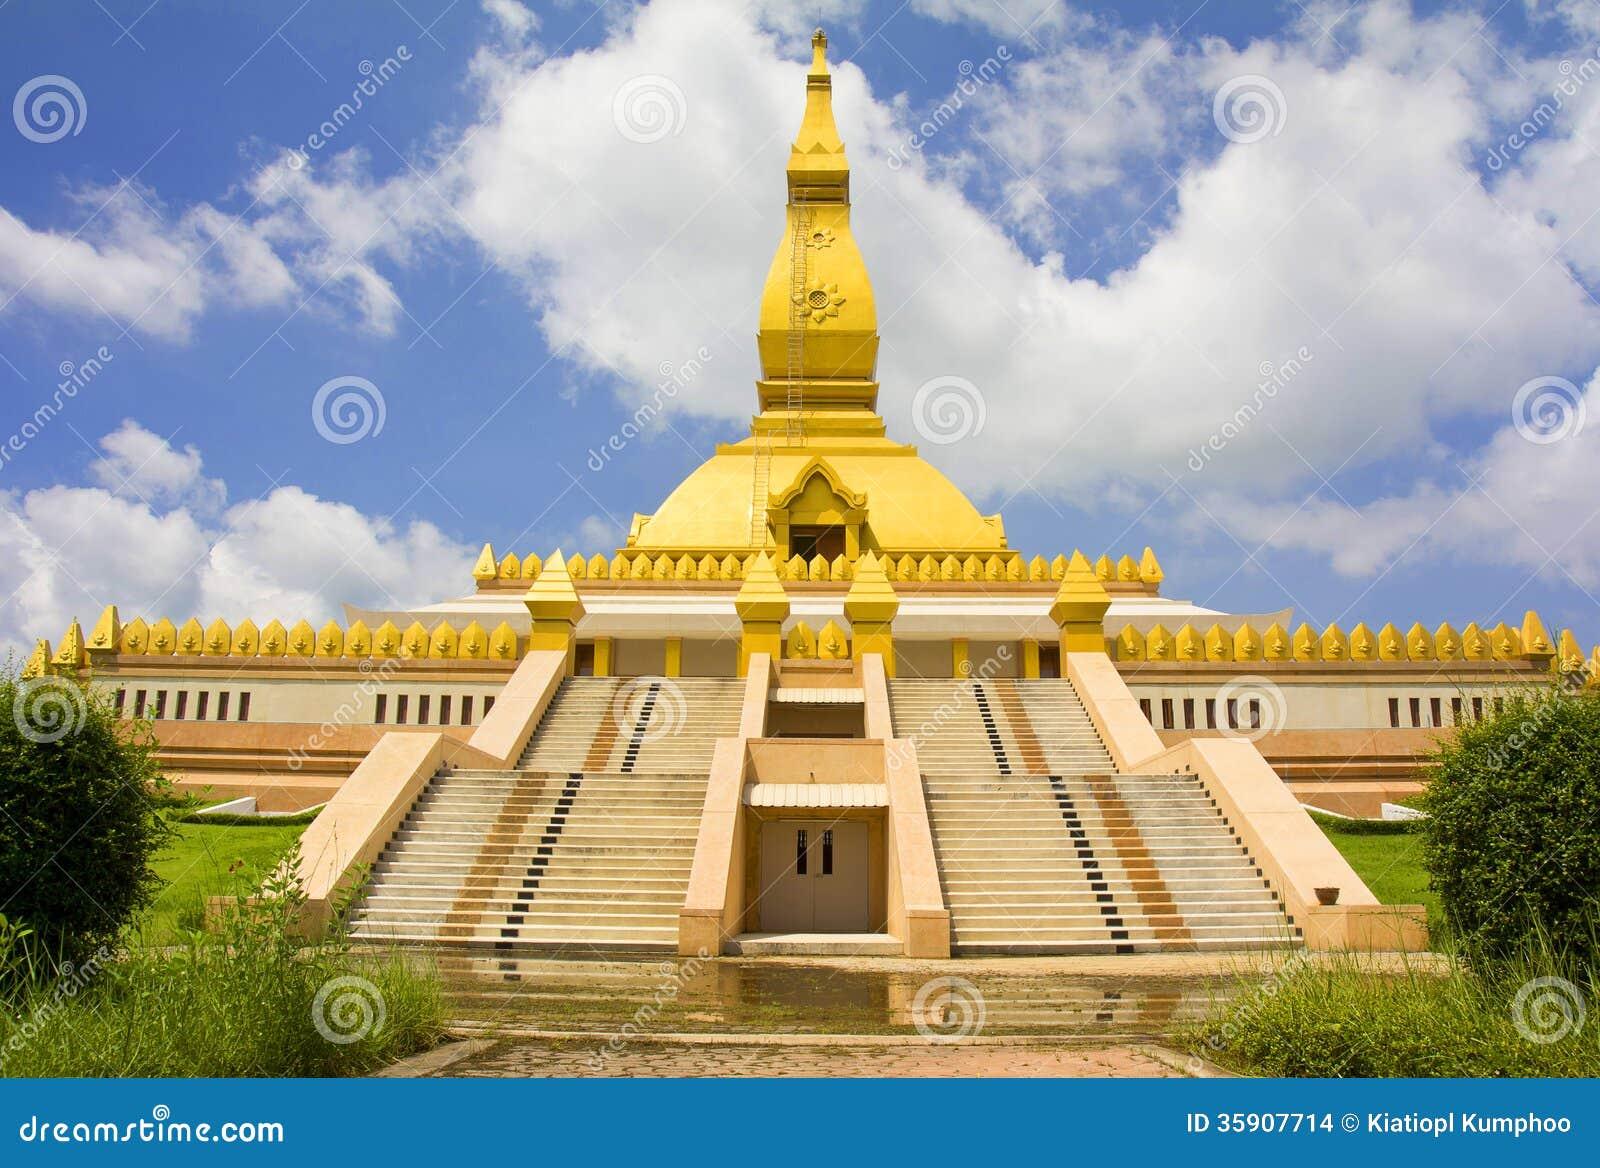 Roi Et Thailand  city photo : Pagoda Mahabua, Roi Et, Thailand Stock Images Image: 35907714